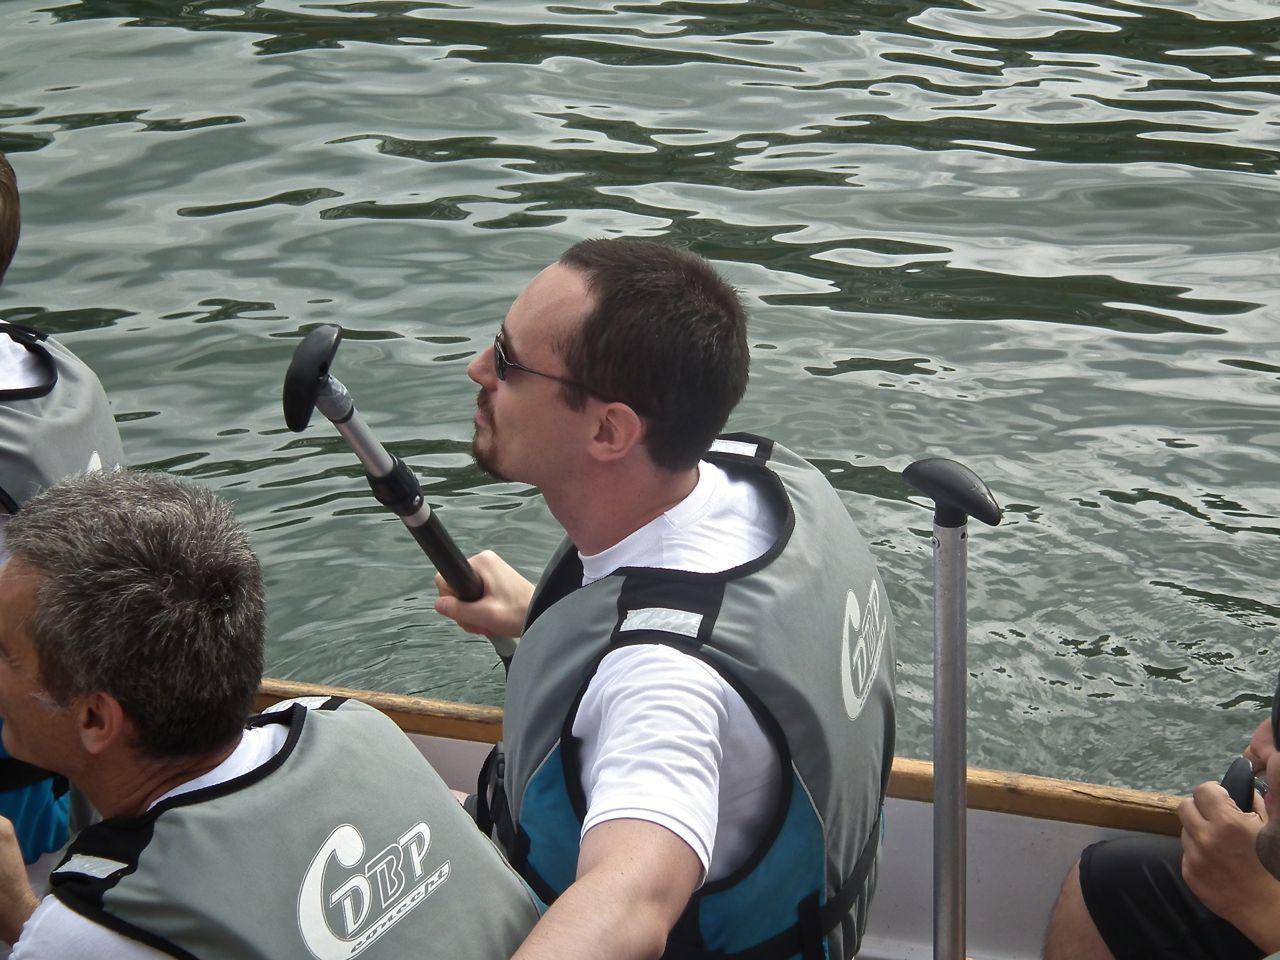 Samedi sur l'eau 1